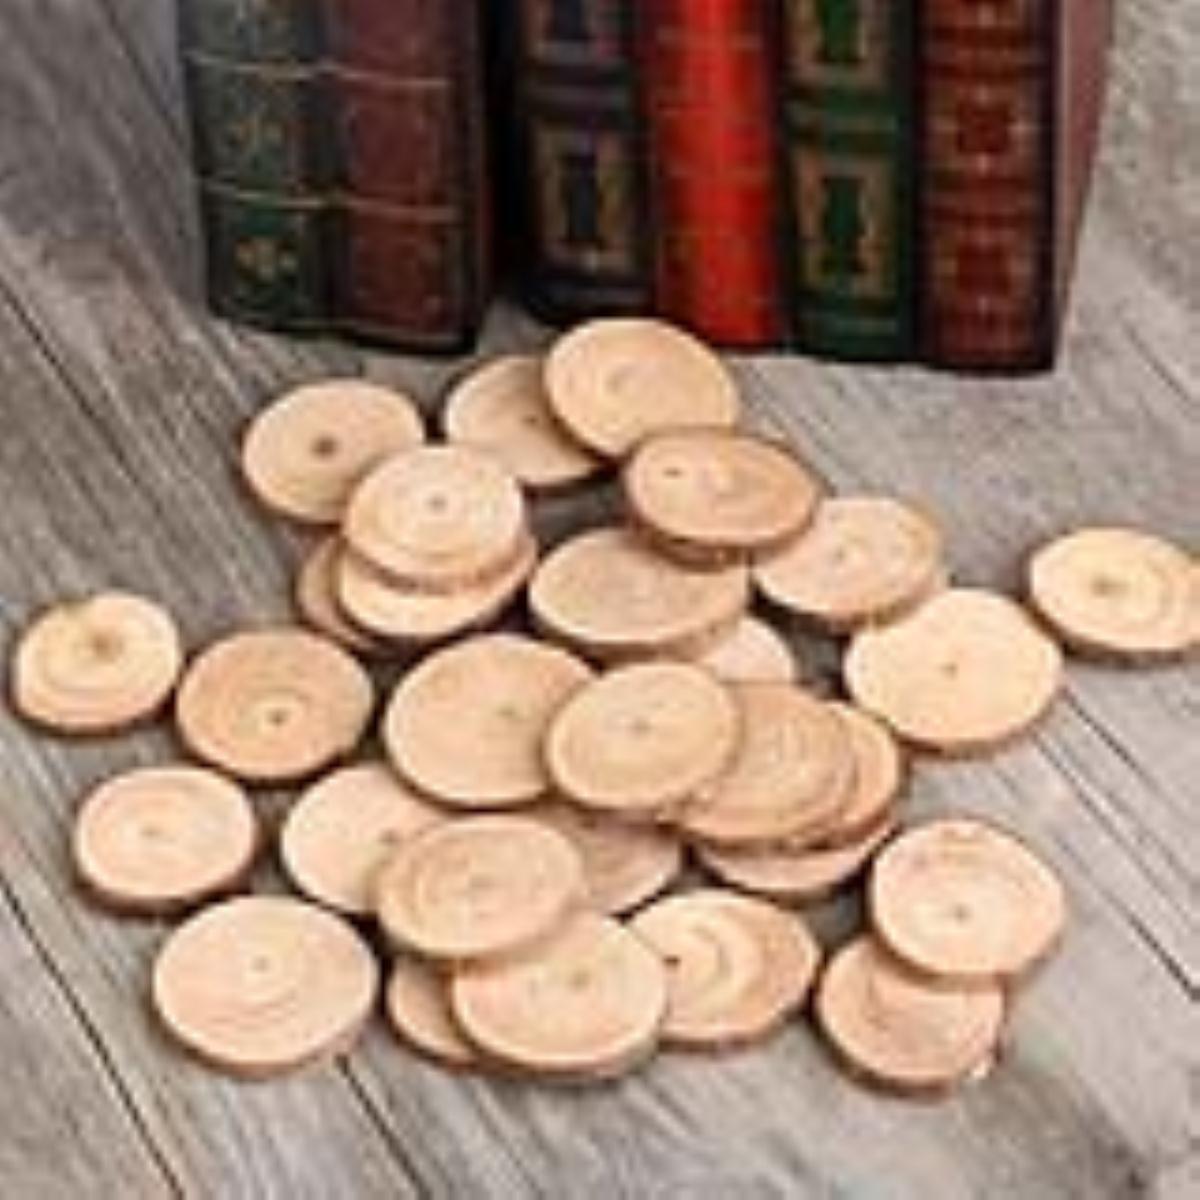 30pcs 4 5cm Wood Log Slices Discs For Diy Crafts Wedding